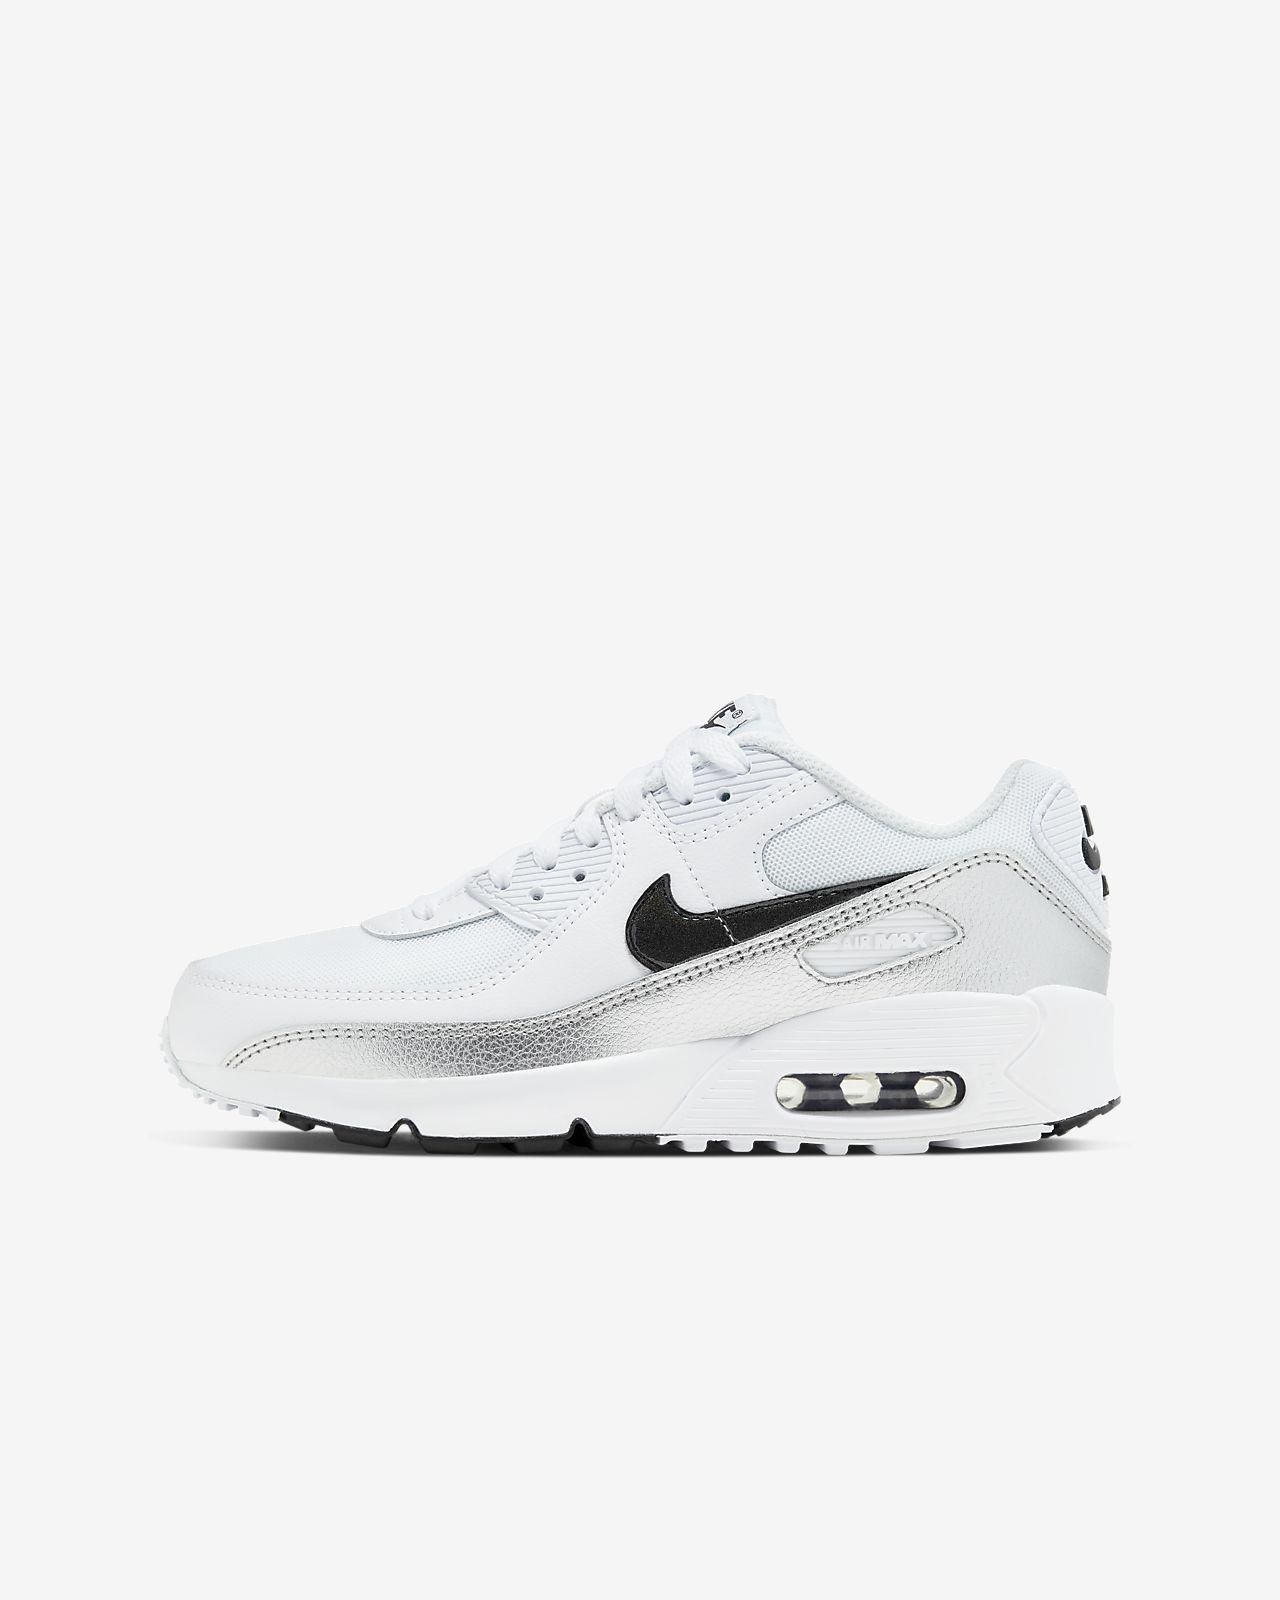 Sko Nike Air Max 90 för ungdom